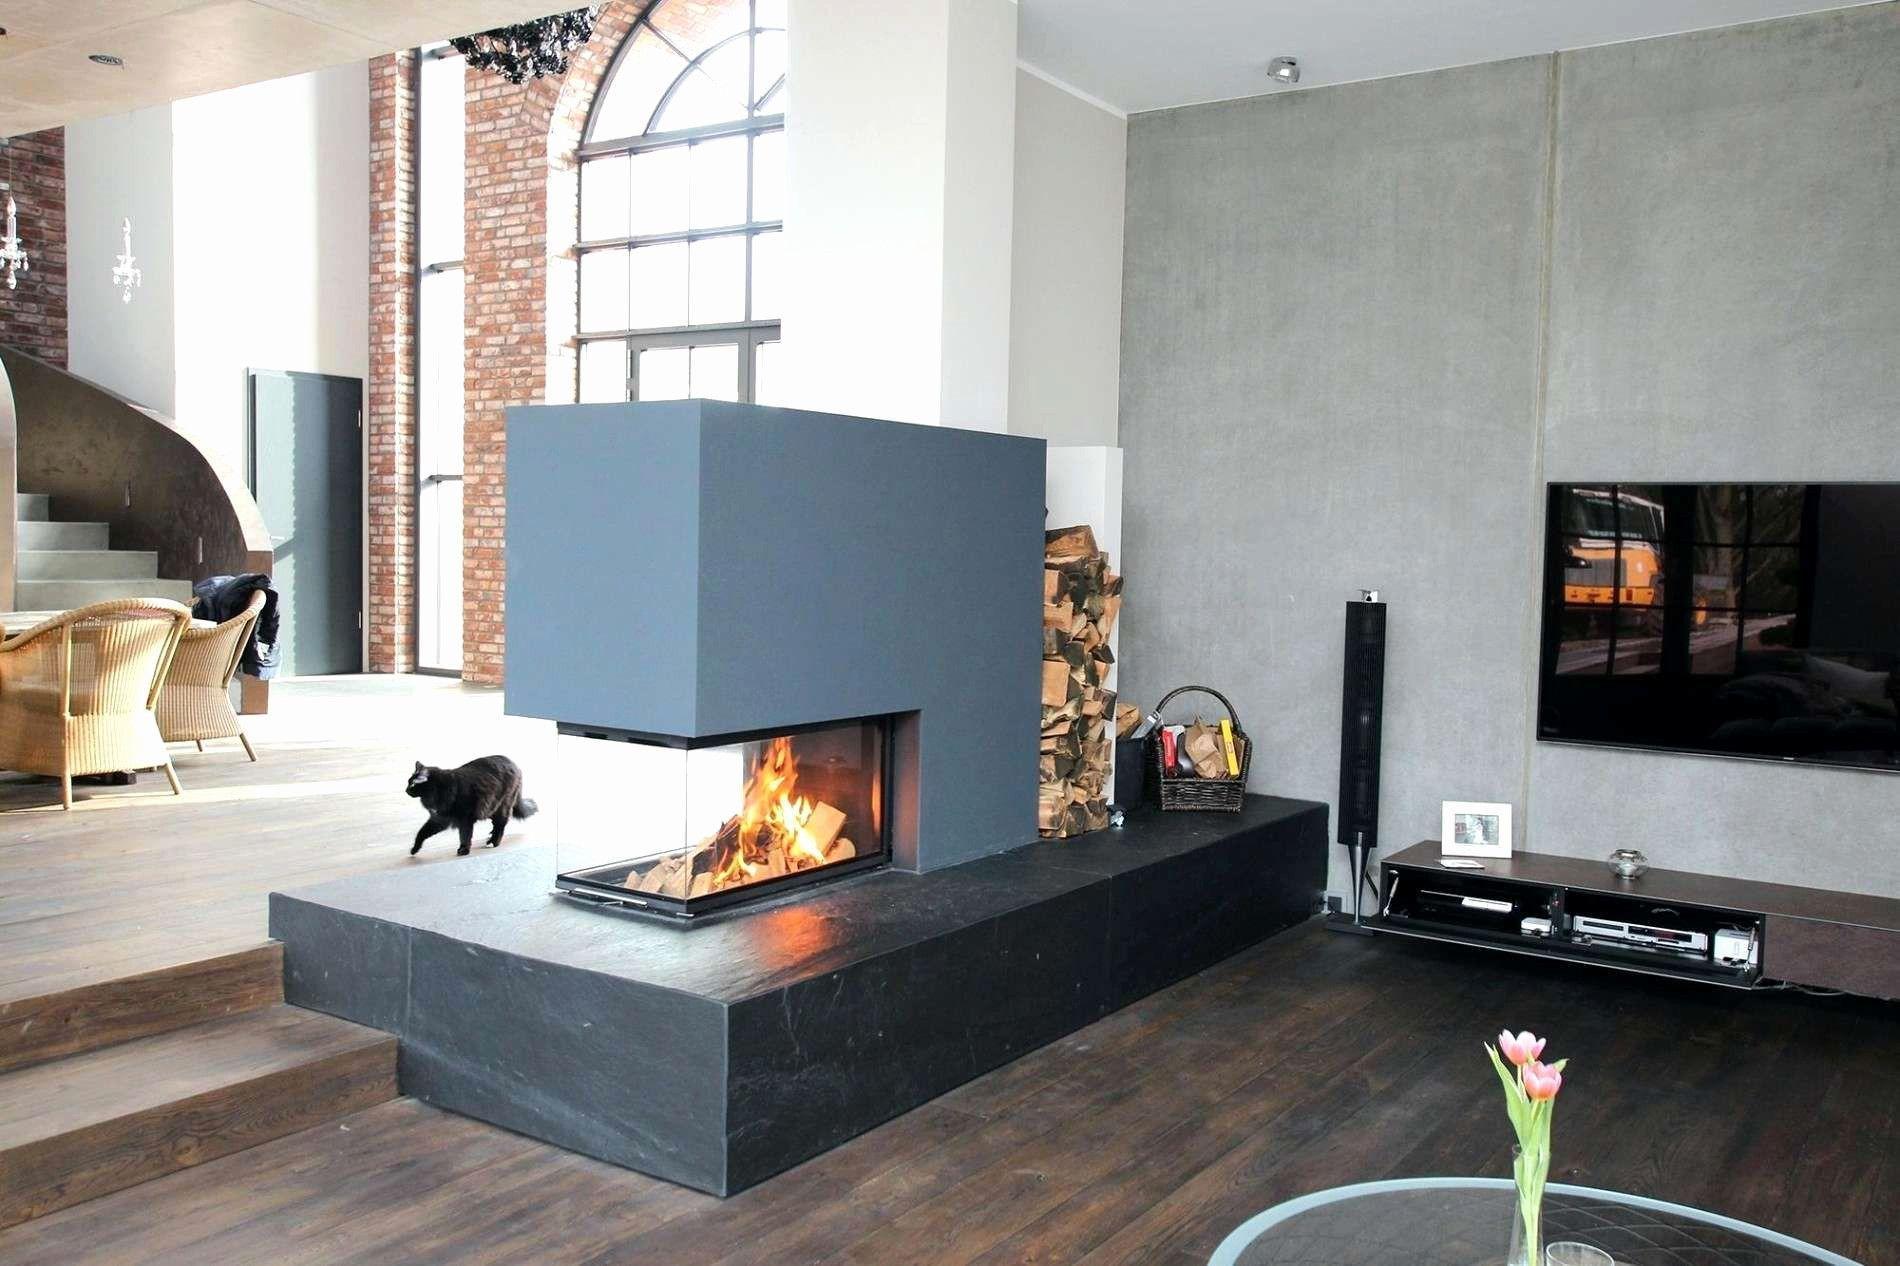 Bauen Check Einzigartig Feuerstelle Gas Selber Bauen Check Einzigartig Feuerstell In 2020 Modern Fireplace Living Room Decor Unique Elegant Living Room Decor